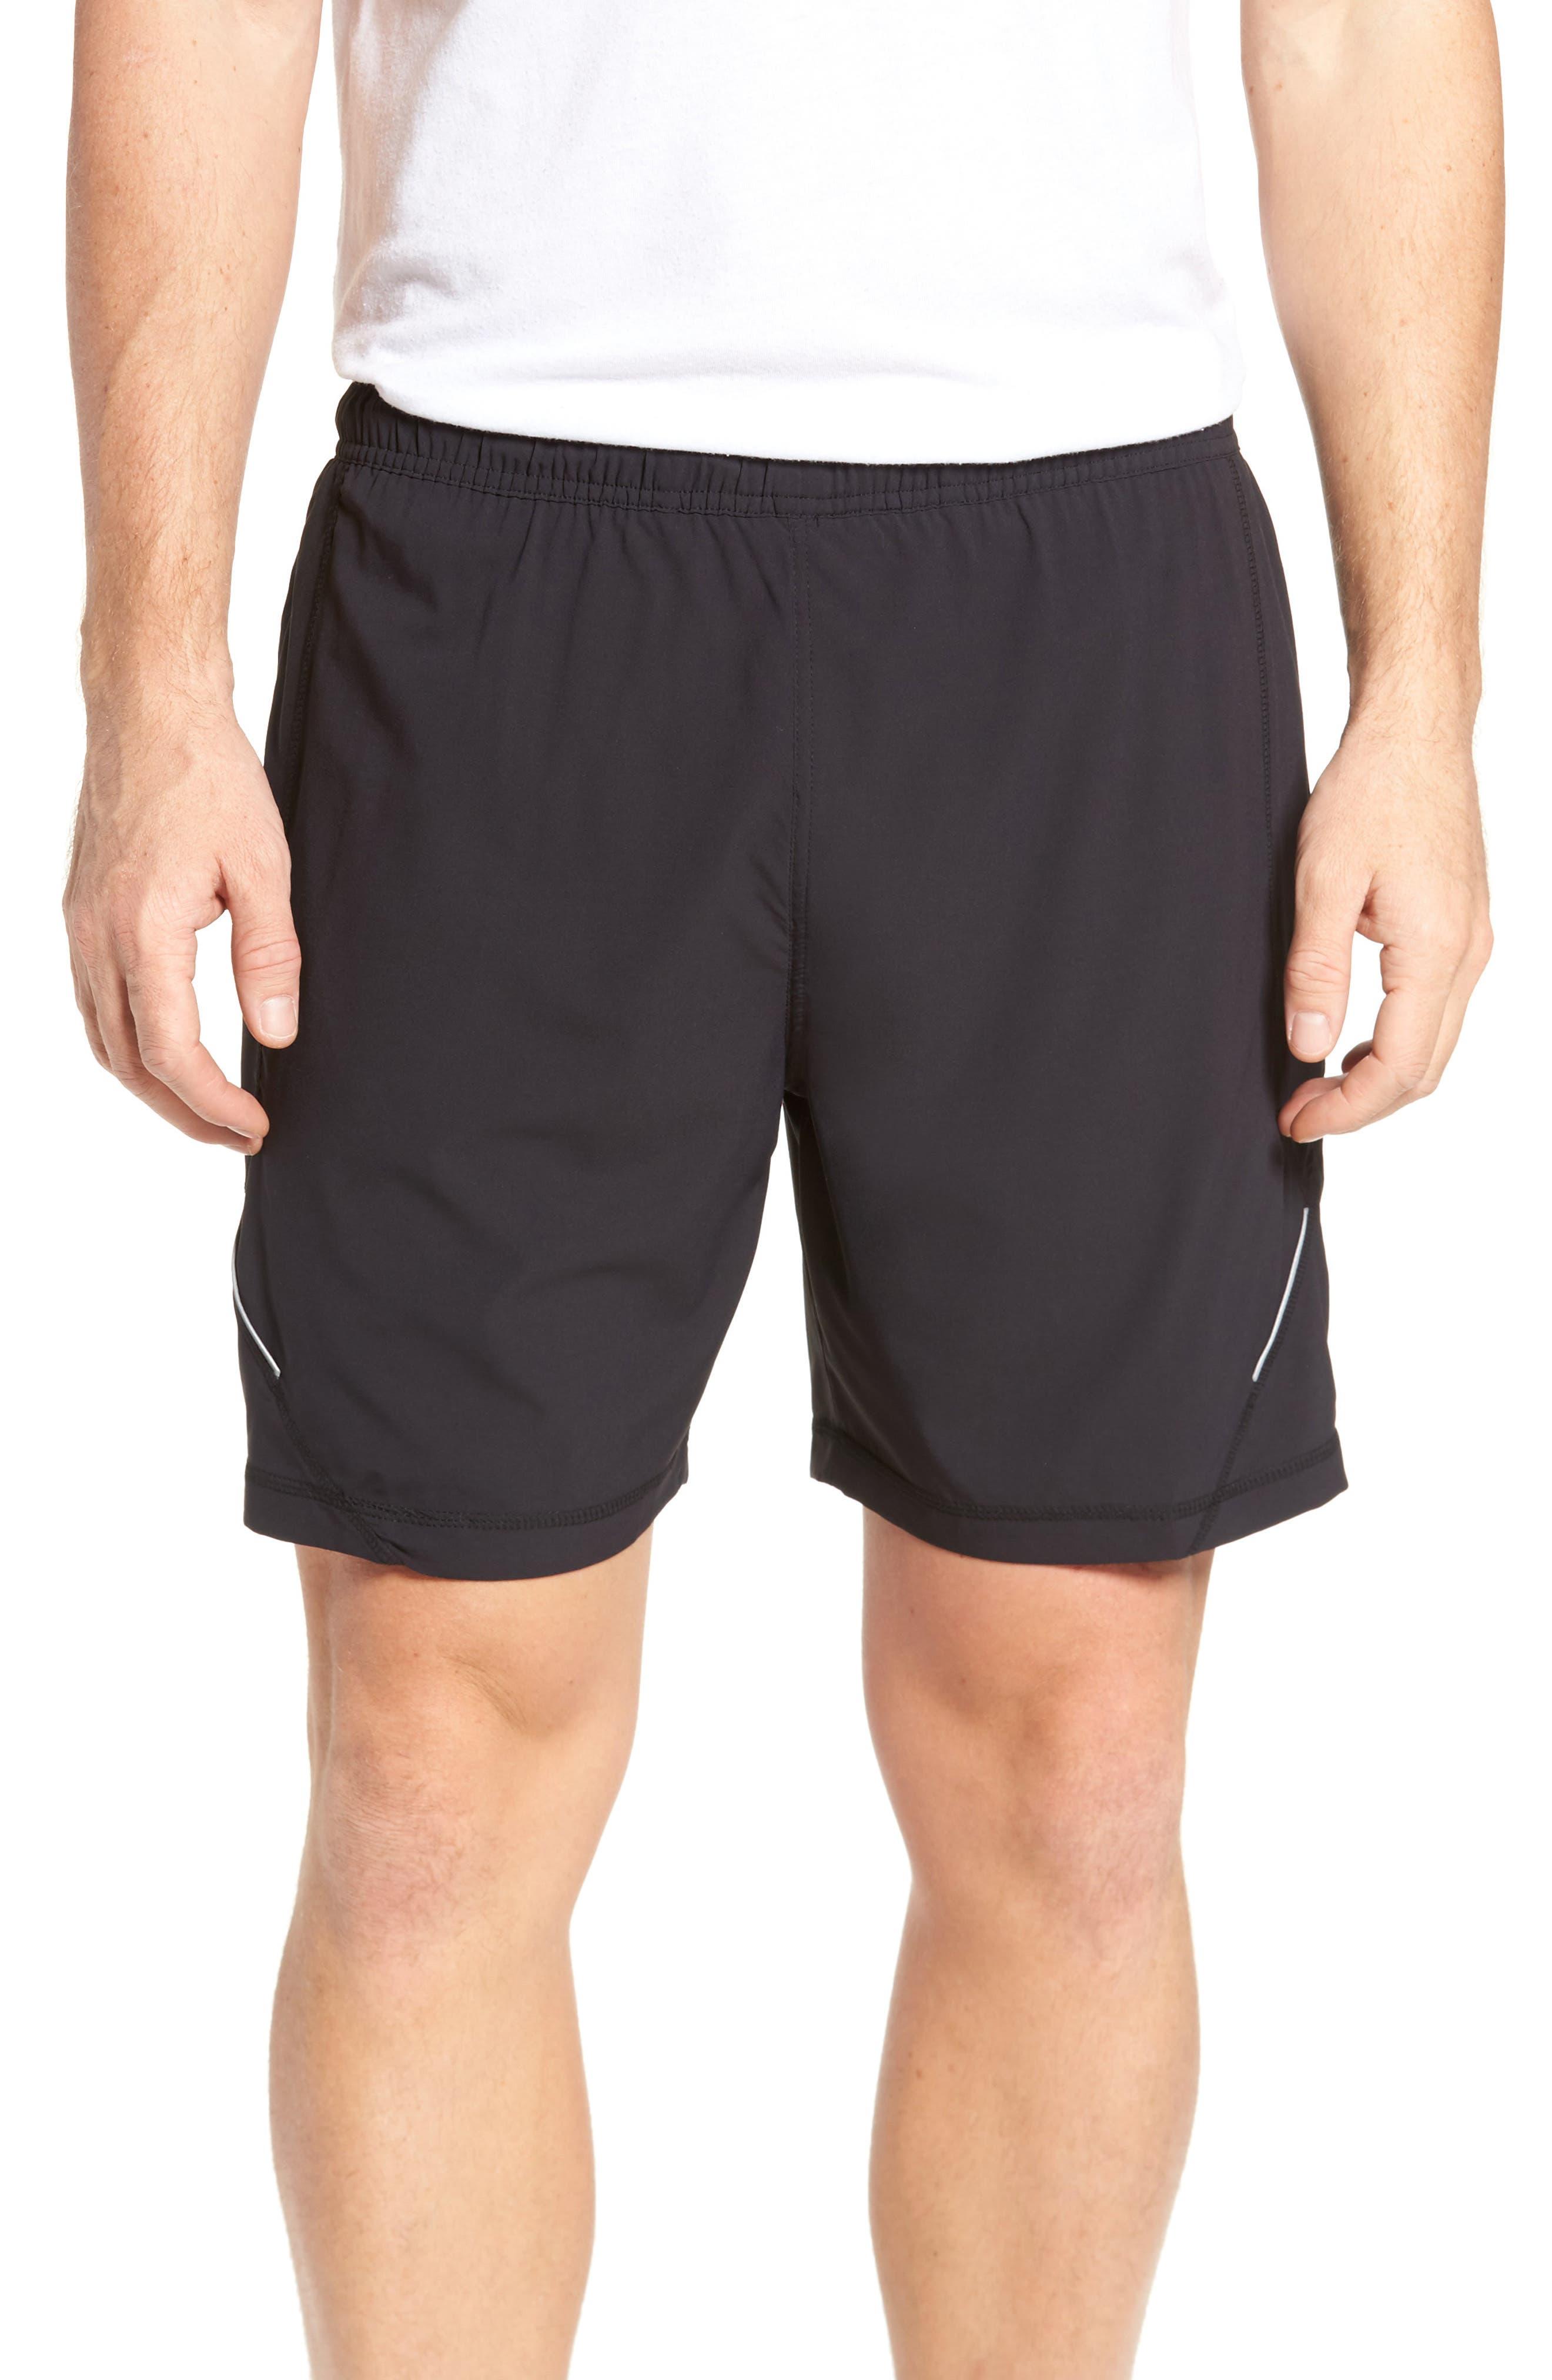 Propulsion Athletic Shorts,                             Main thumbnail 1, color,                             BLACK